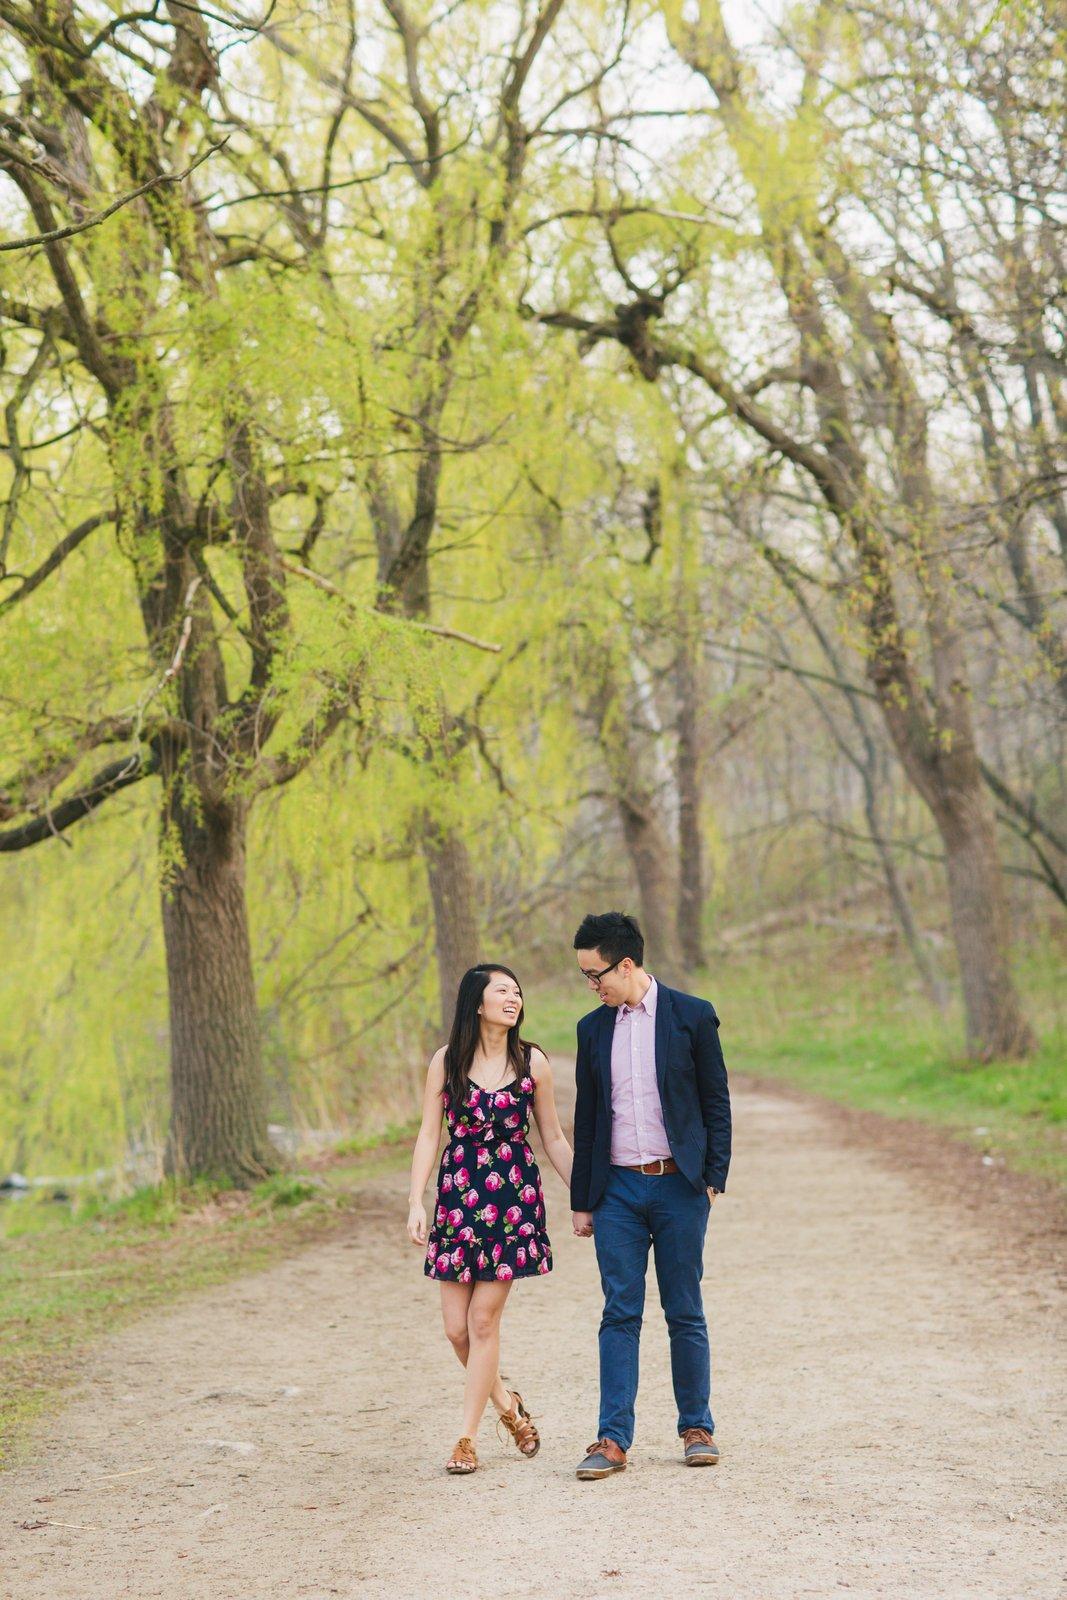 Jessica-Charles-Engagement-High-Park-Cherry-Blossom-004